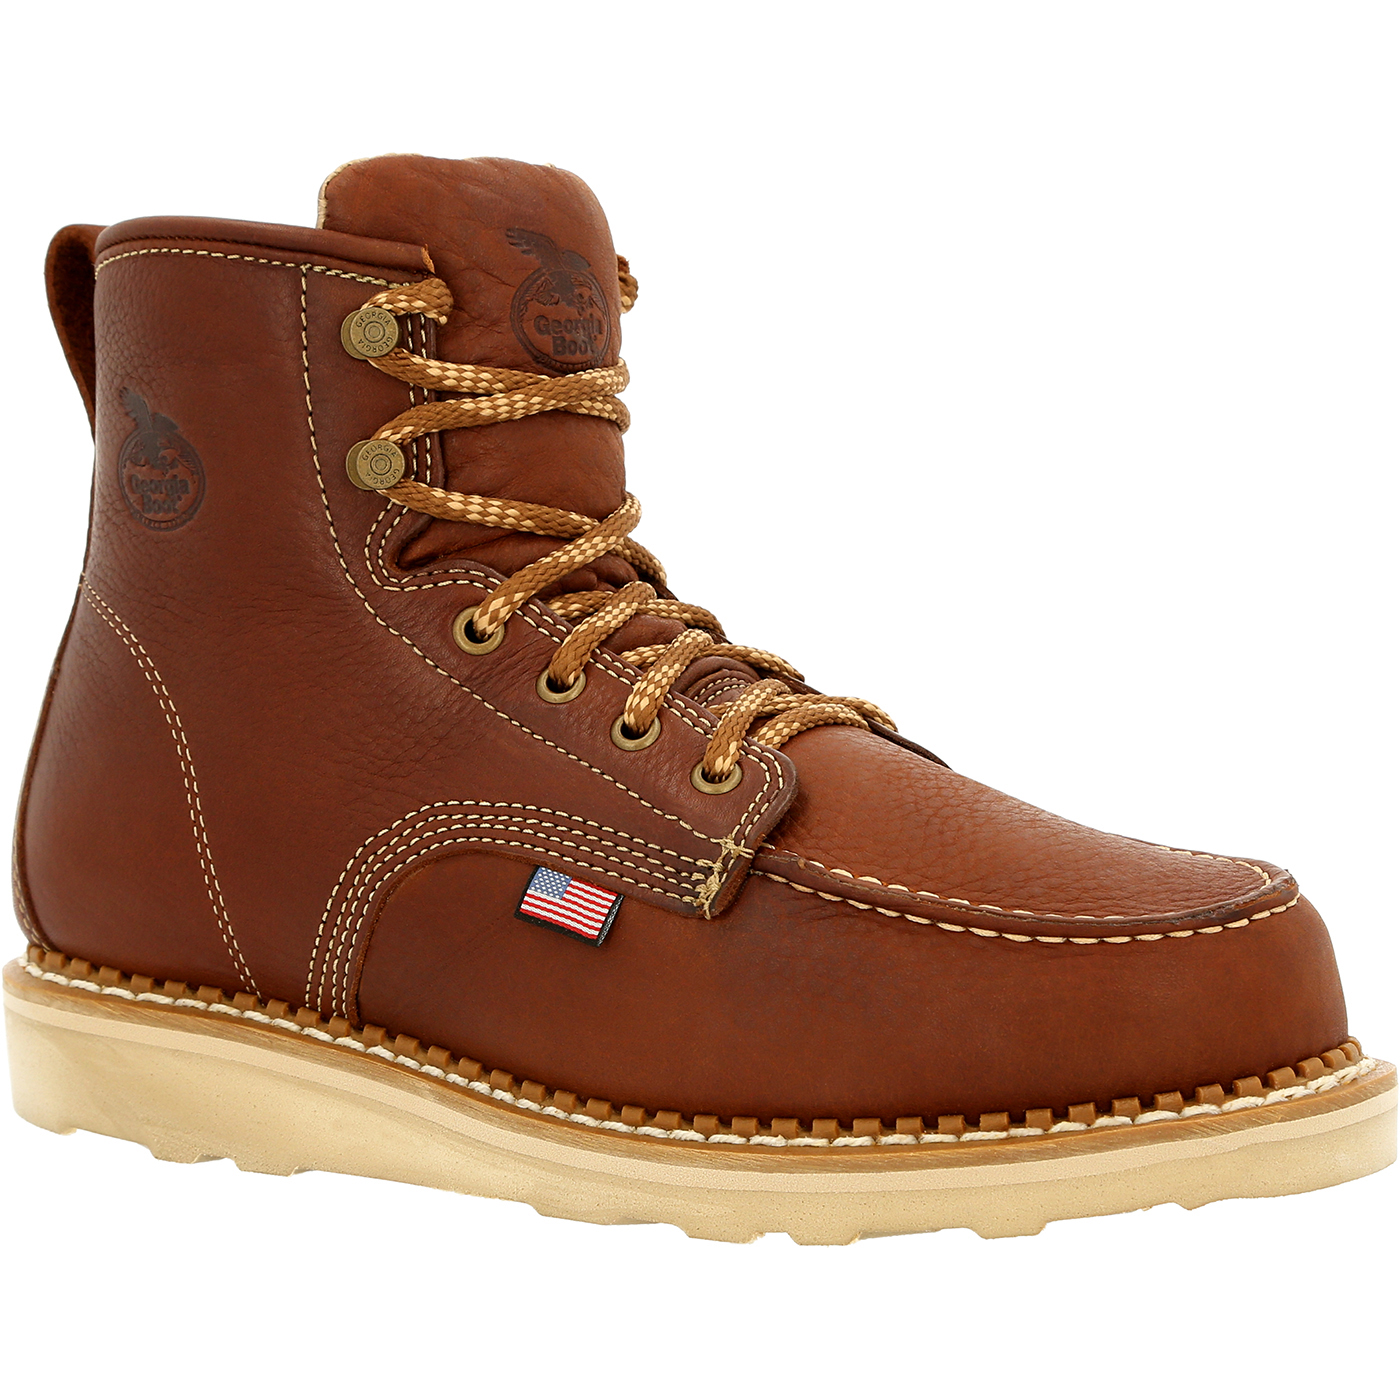 851939662ee Georgia Boot USA Wedge Moc Toe Work Boot